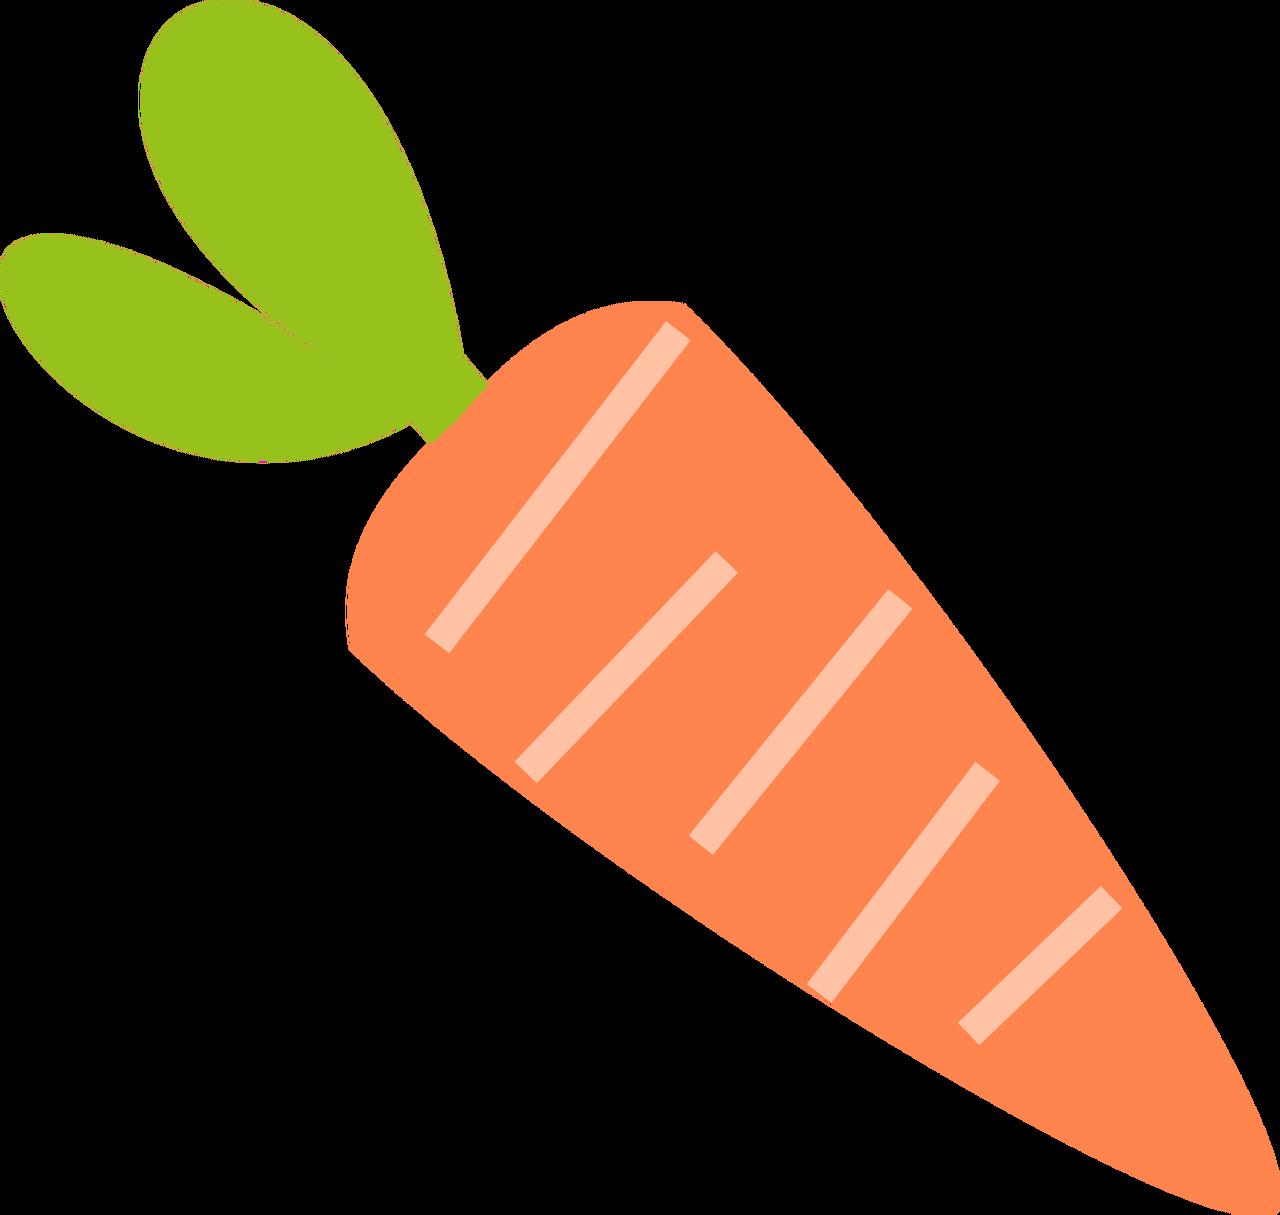 Carrot SVG Cut File